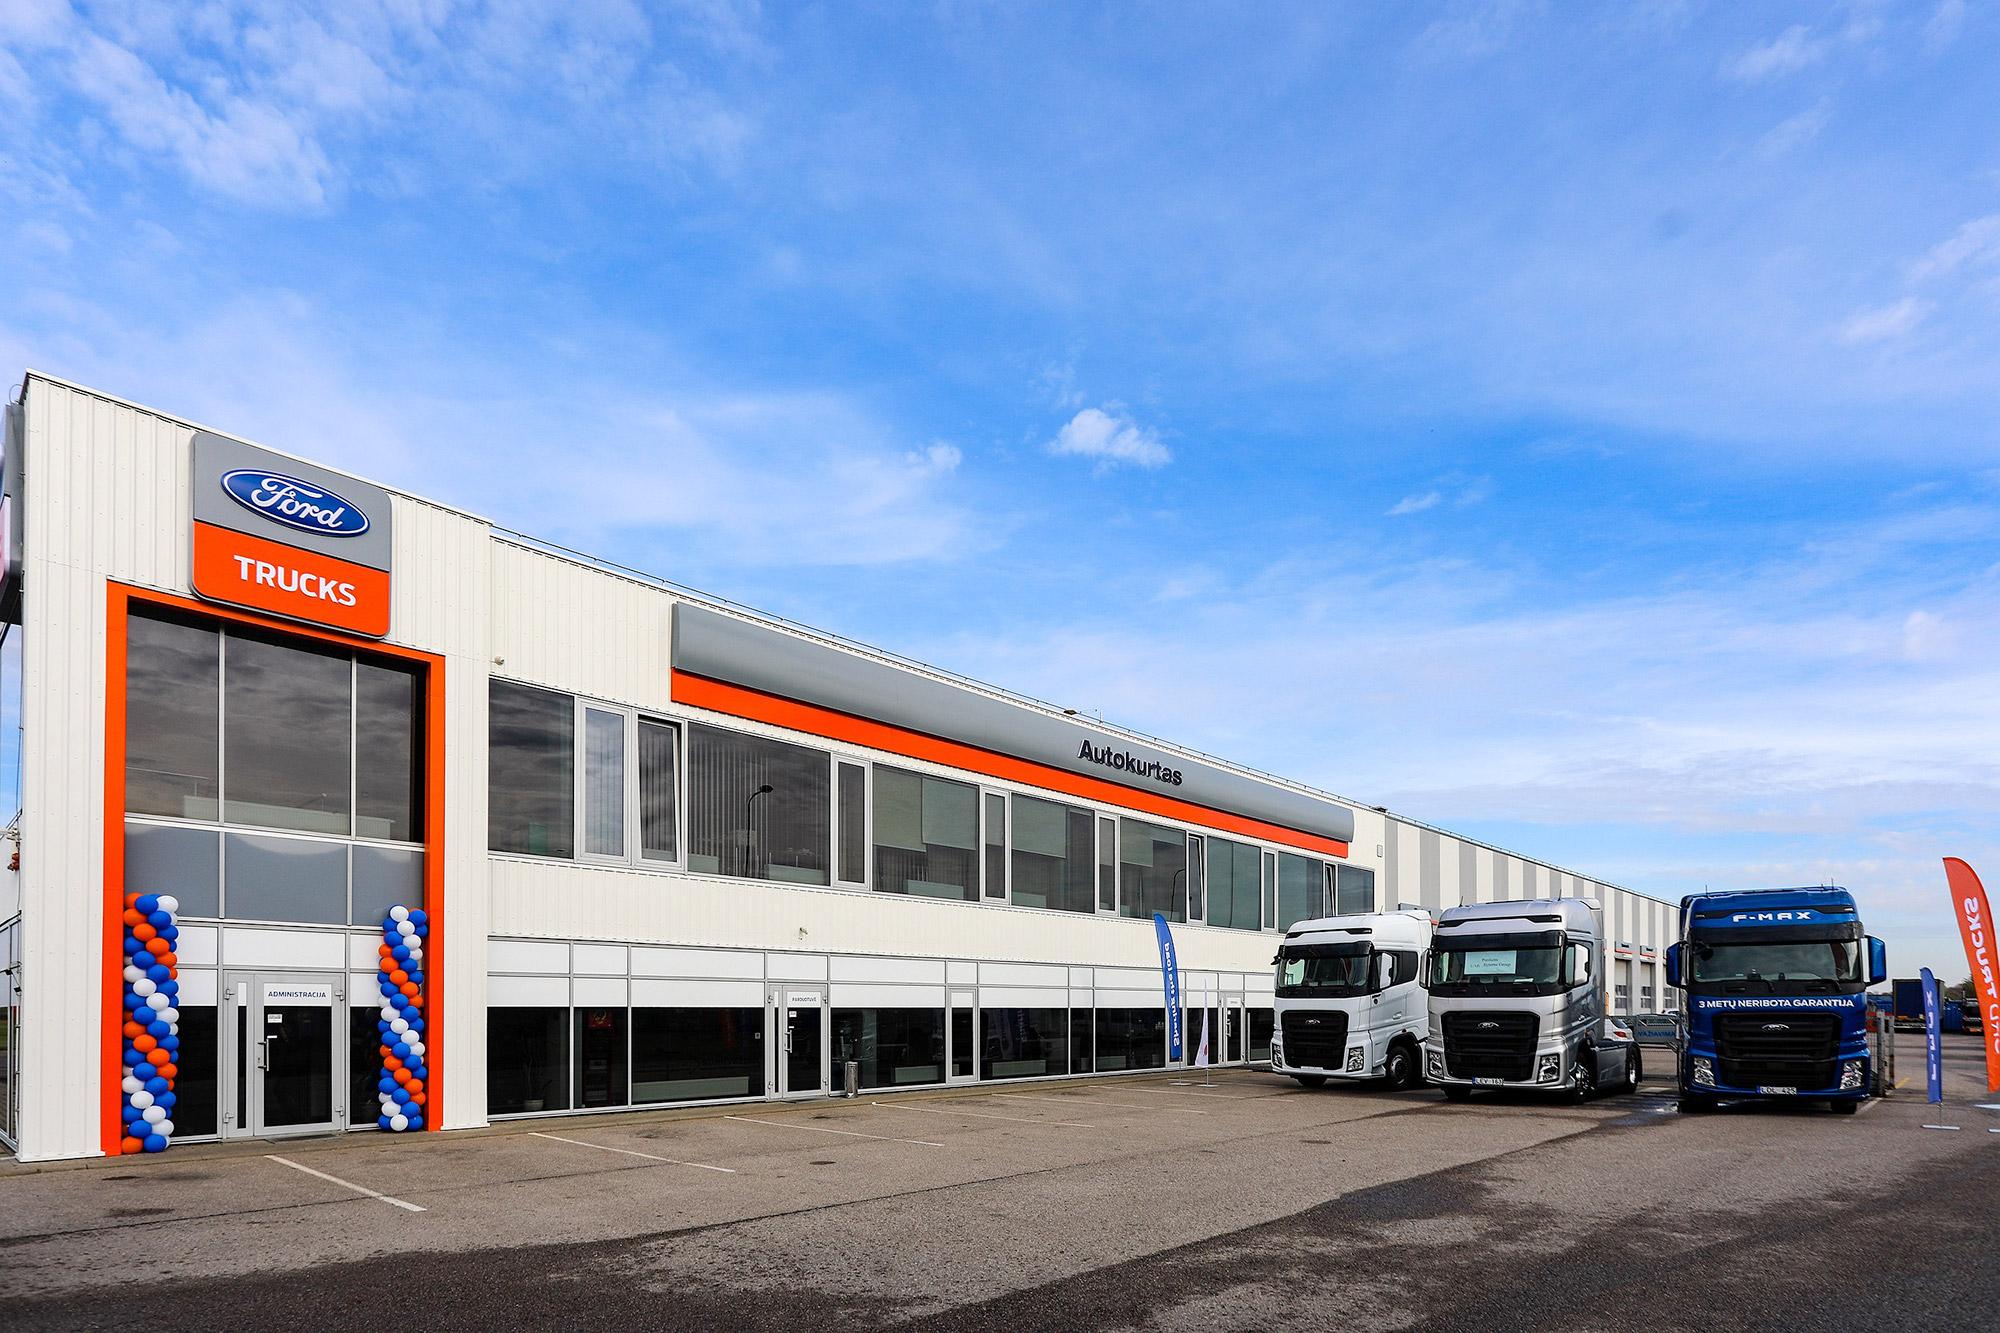 ford-trucks-litvanya-tesis.jpg